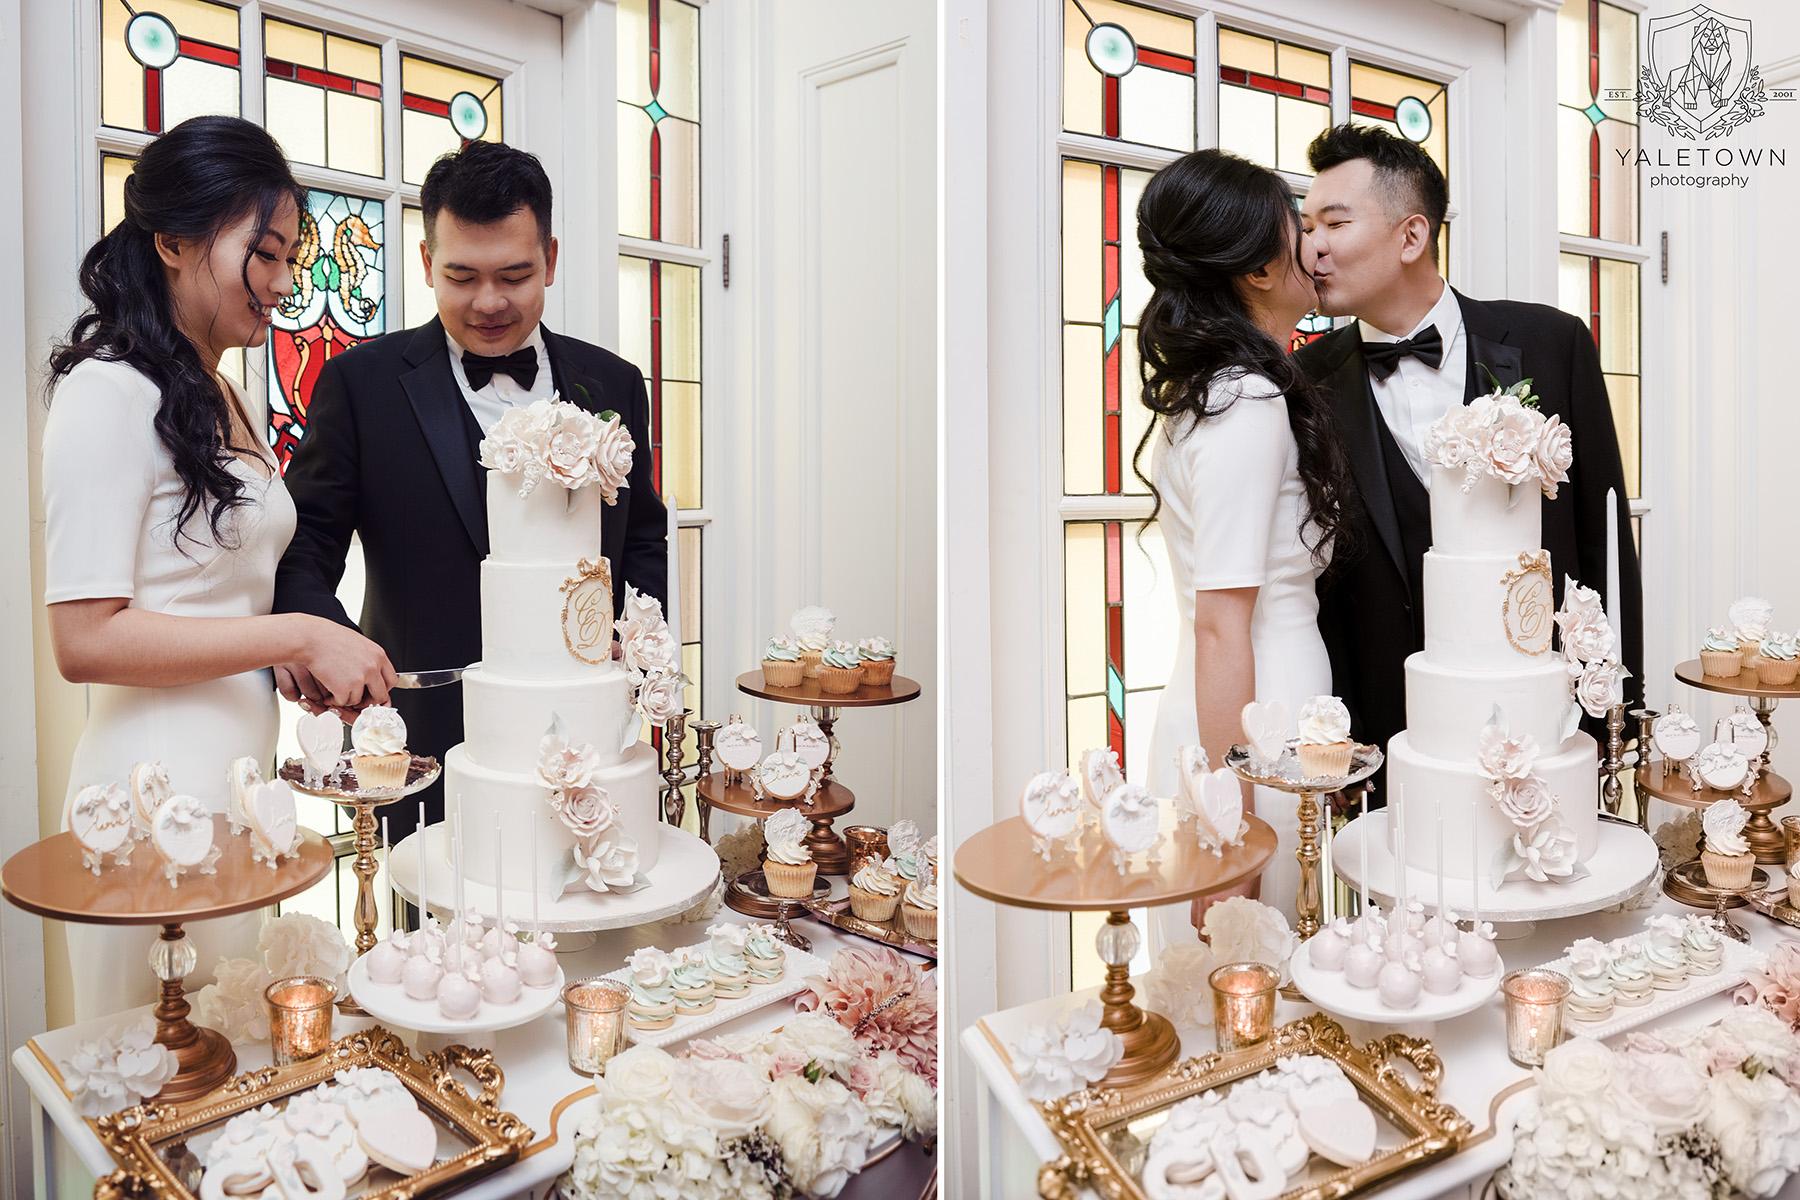 Wedding-Cake-Cutting-Bride-Groom-Rosewood-Hotel-Georgia-Vancouver-Wedding-Yaletown-Photography-photo